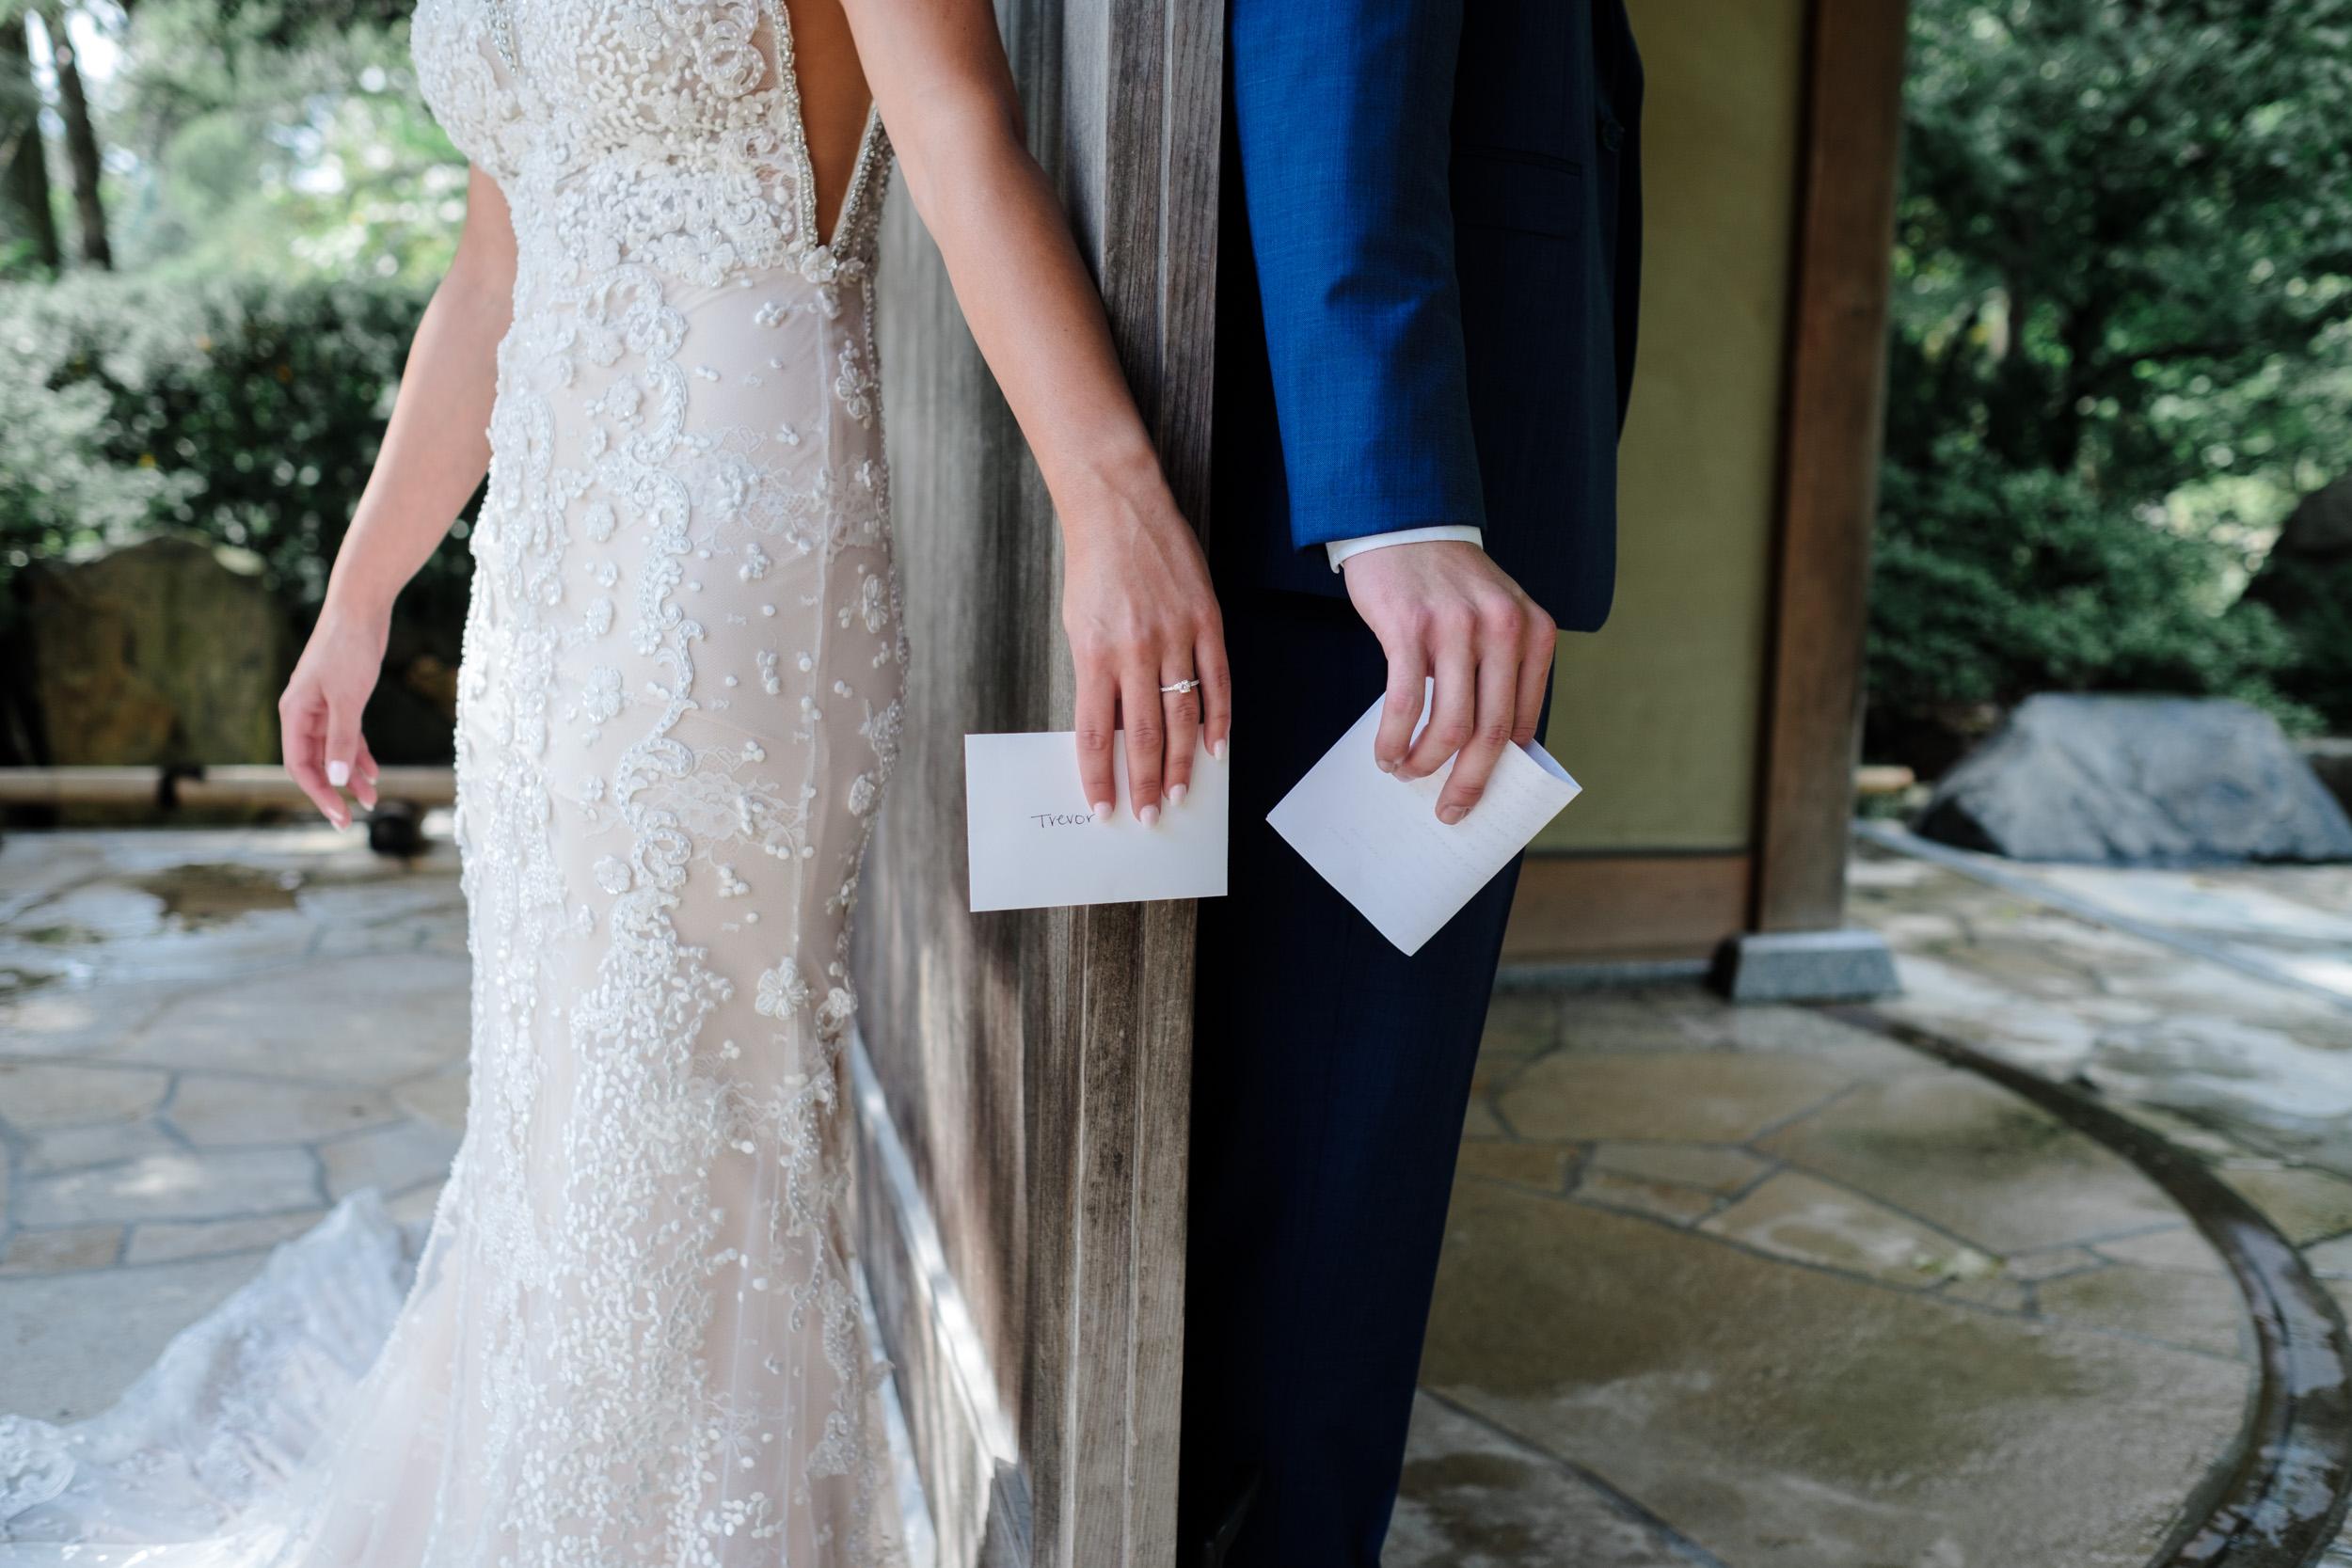 18-09-01 BAP Kiley-Trevor-Anderson-Gardens-Wedding-15.jpg